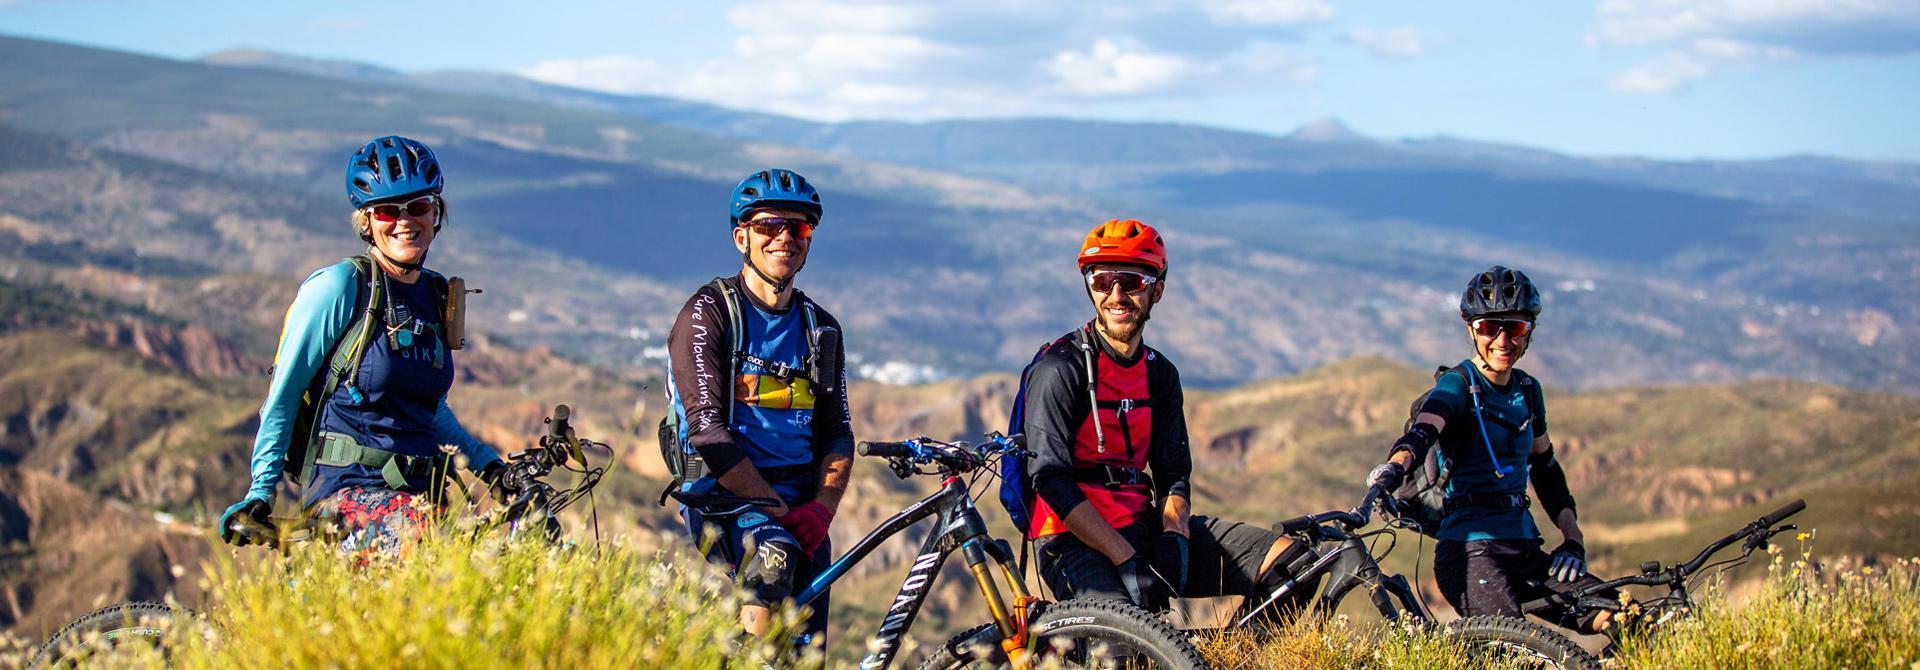 Happy mountain bikers